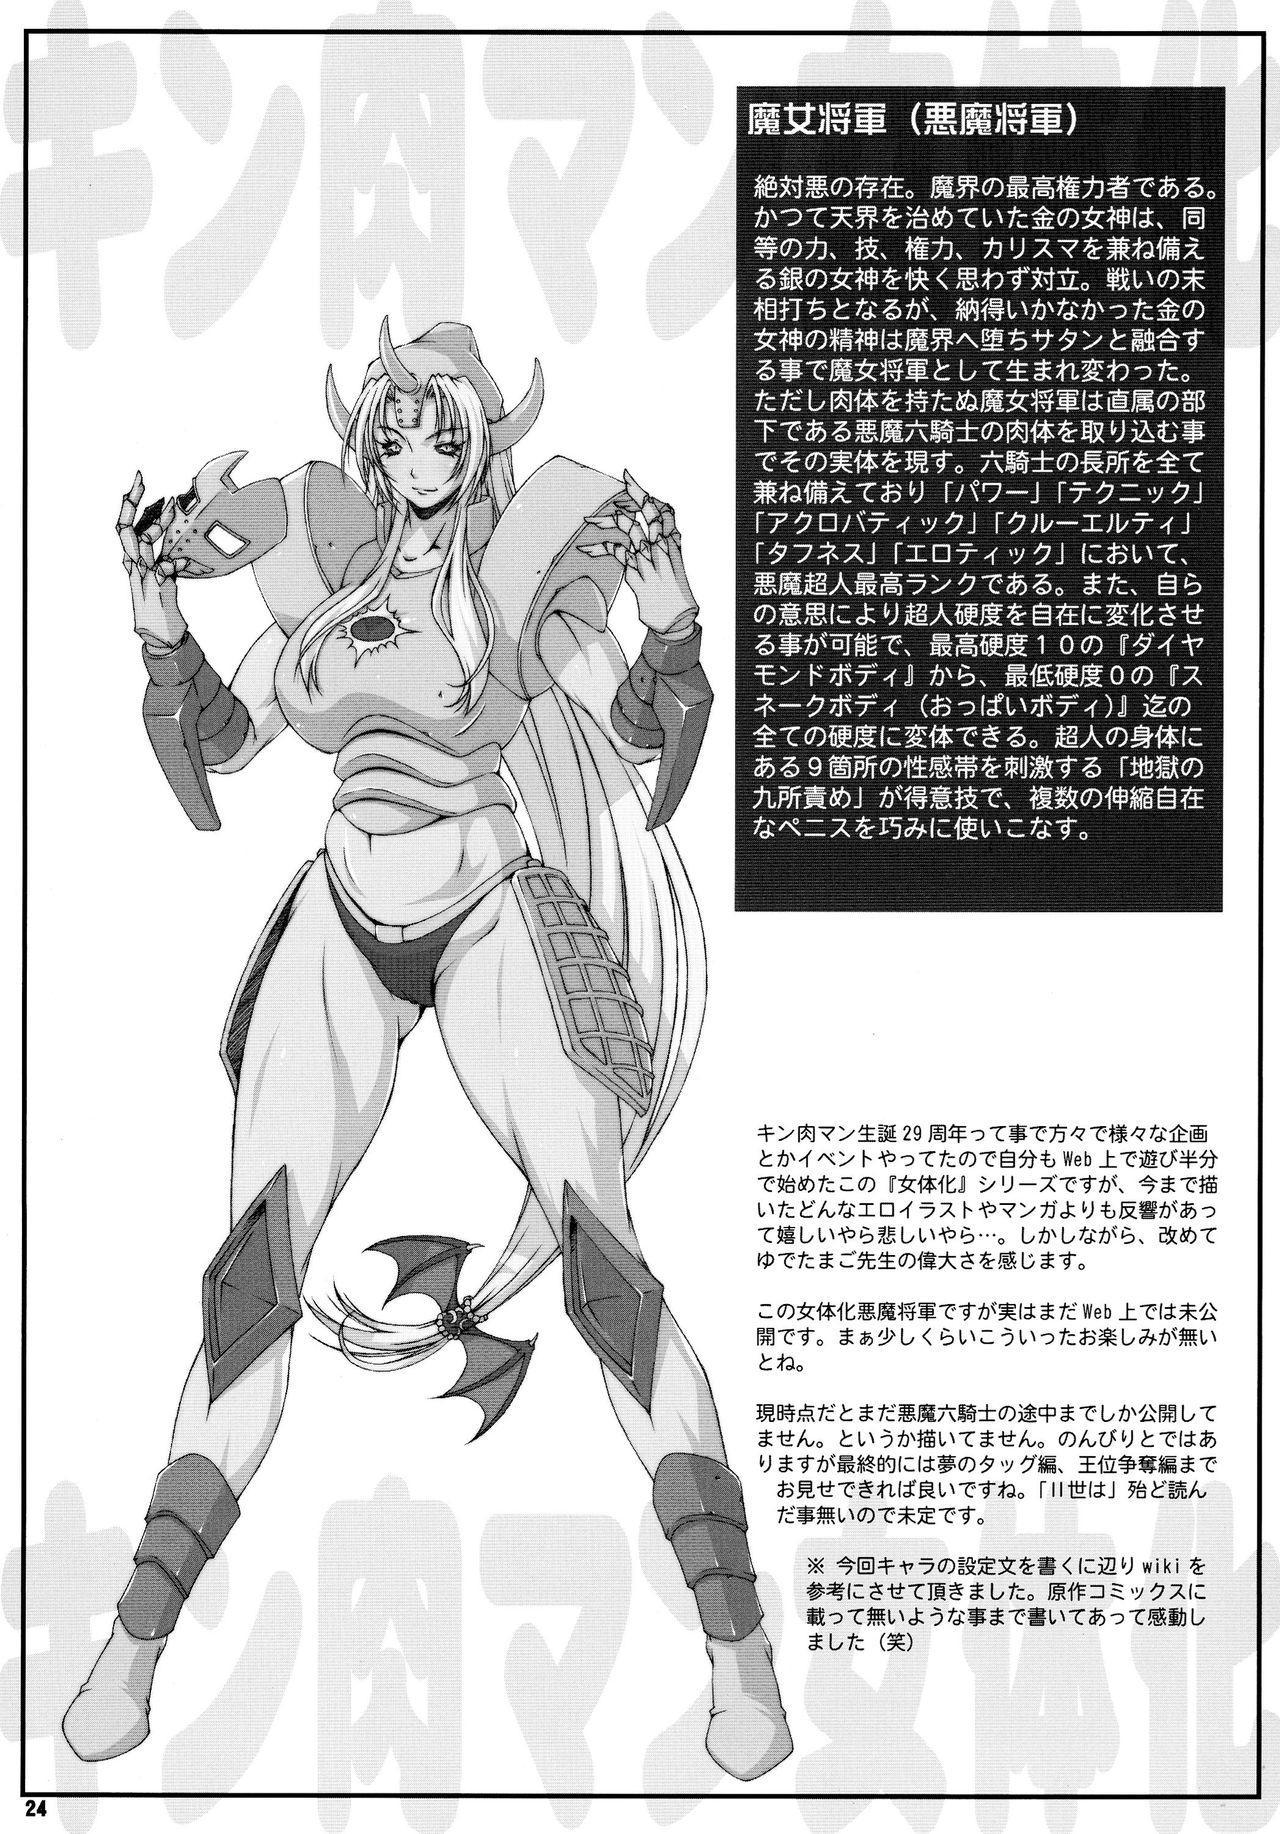 Misoka no 5 23